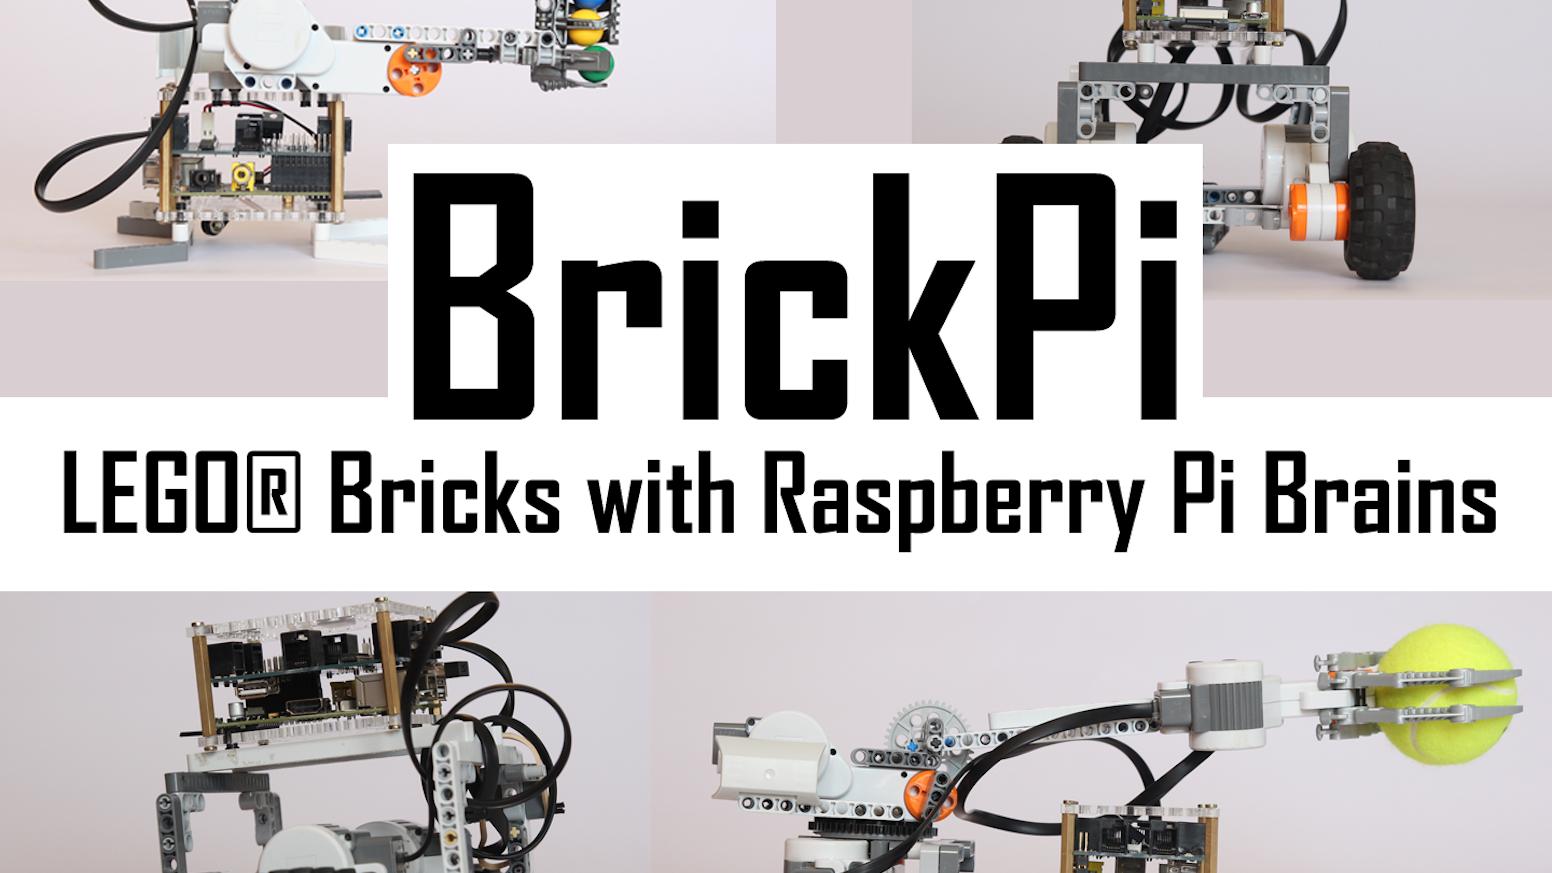 BrickPi: LEGO® Bricks with a Raspberry Pi Brain by Dexter Industries